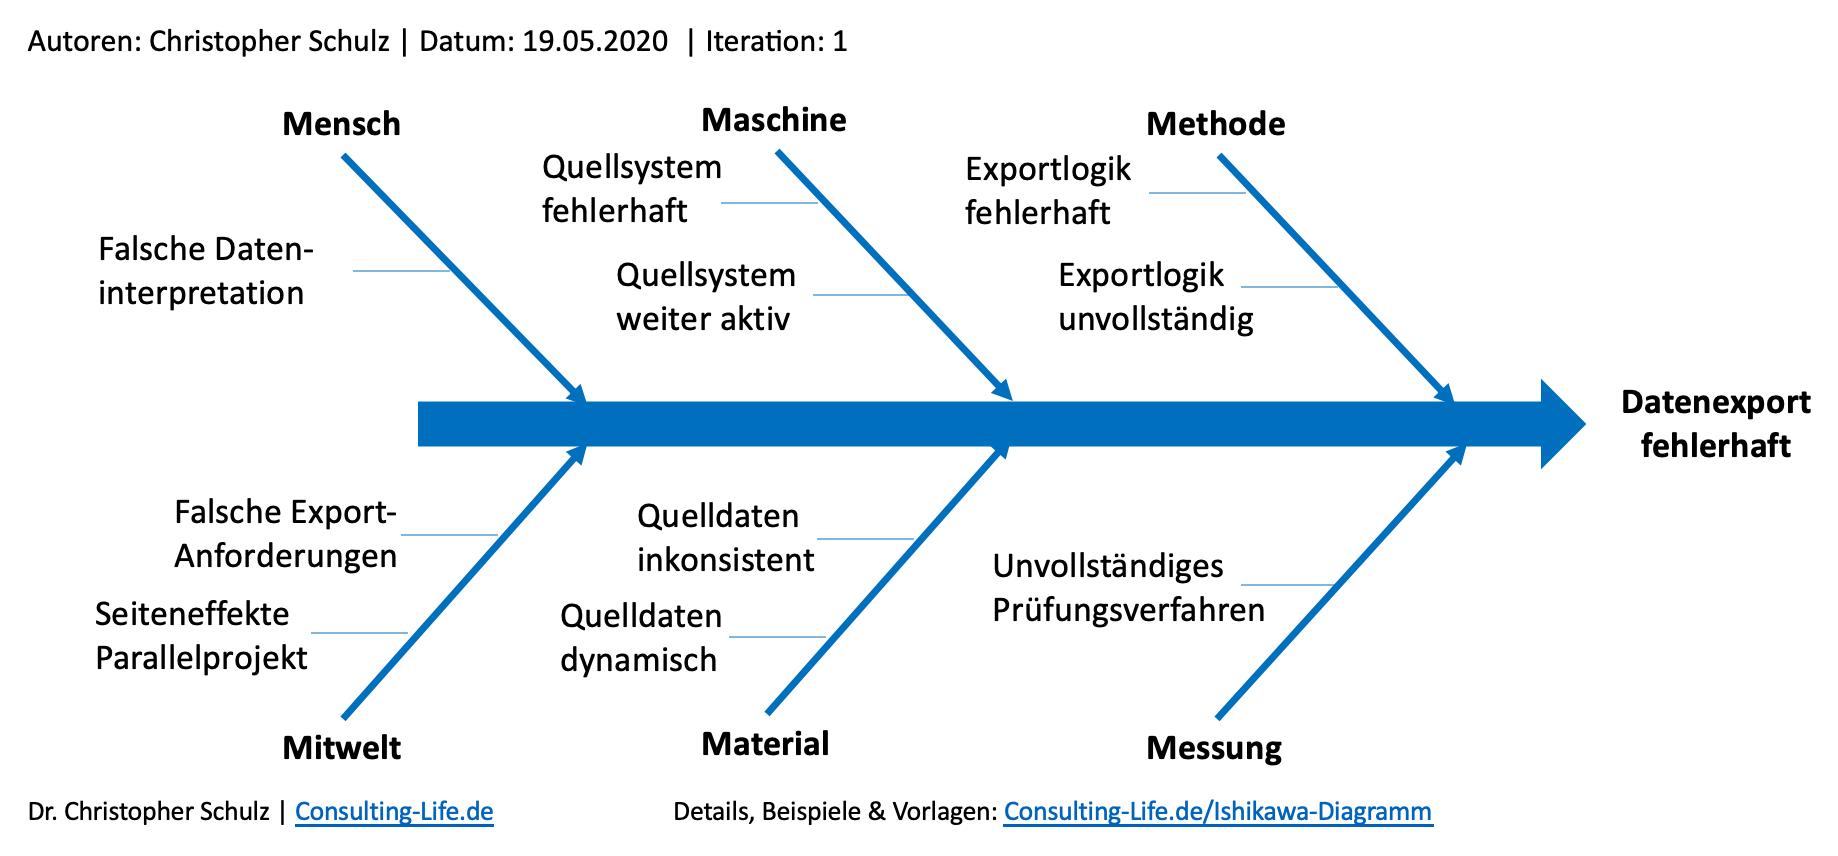 Ishikawa Diagramm - Zweck, Aufbau und Anwendung im Consulting